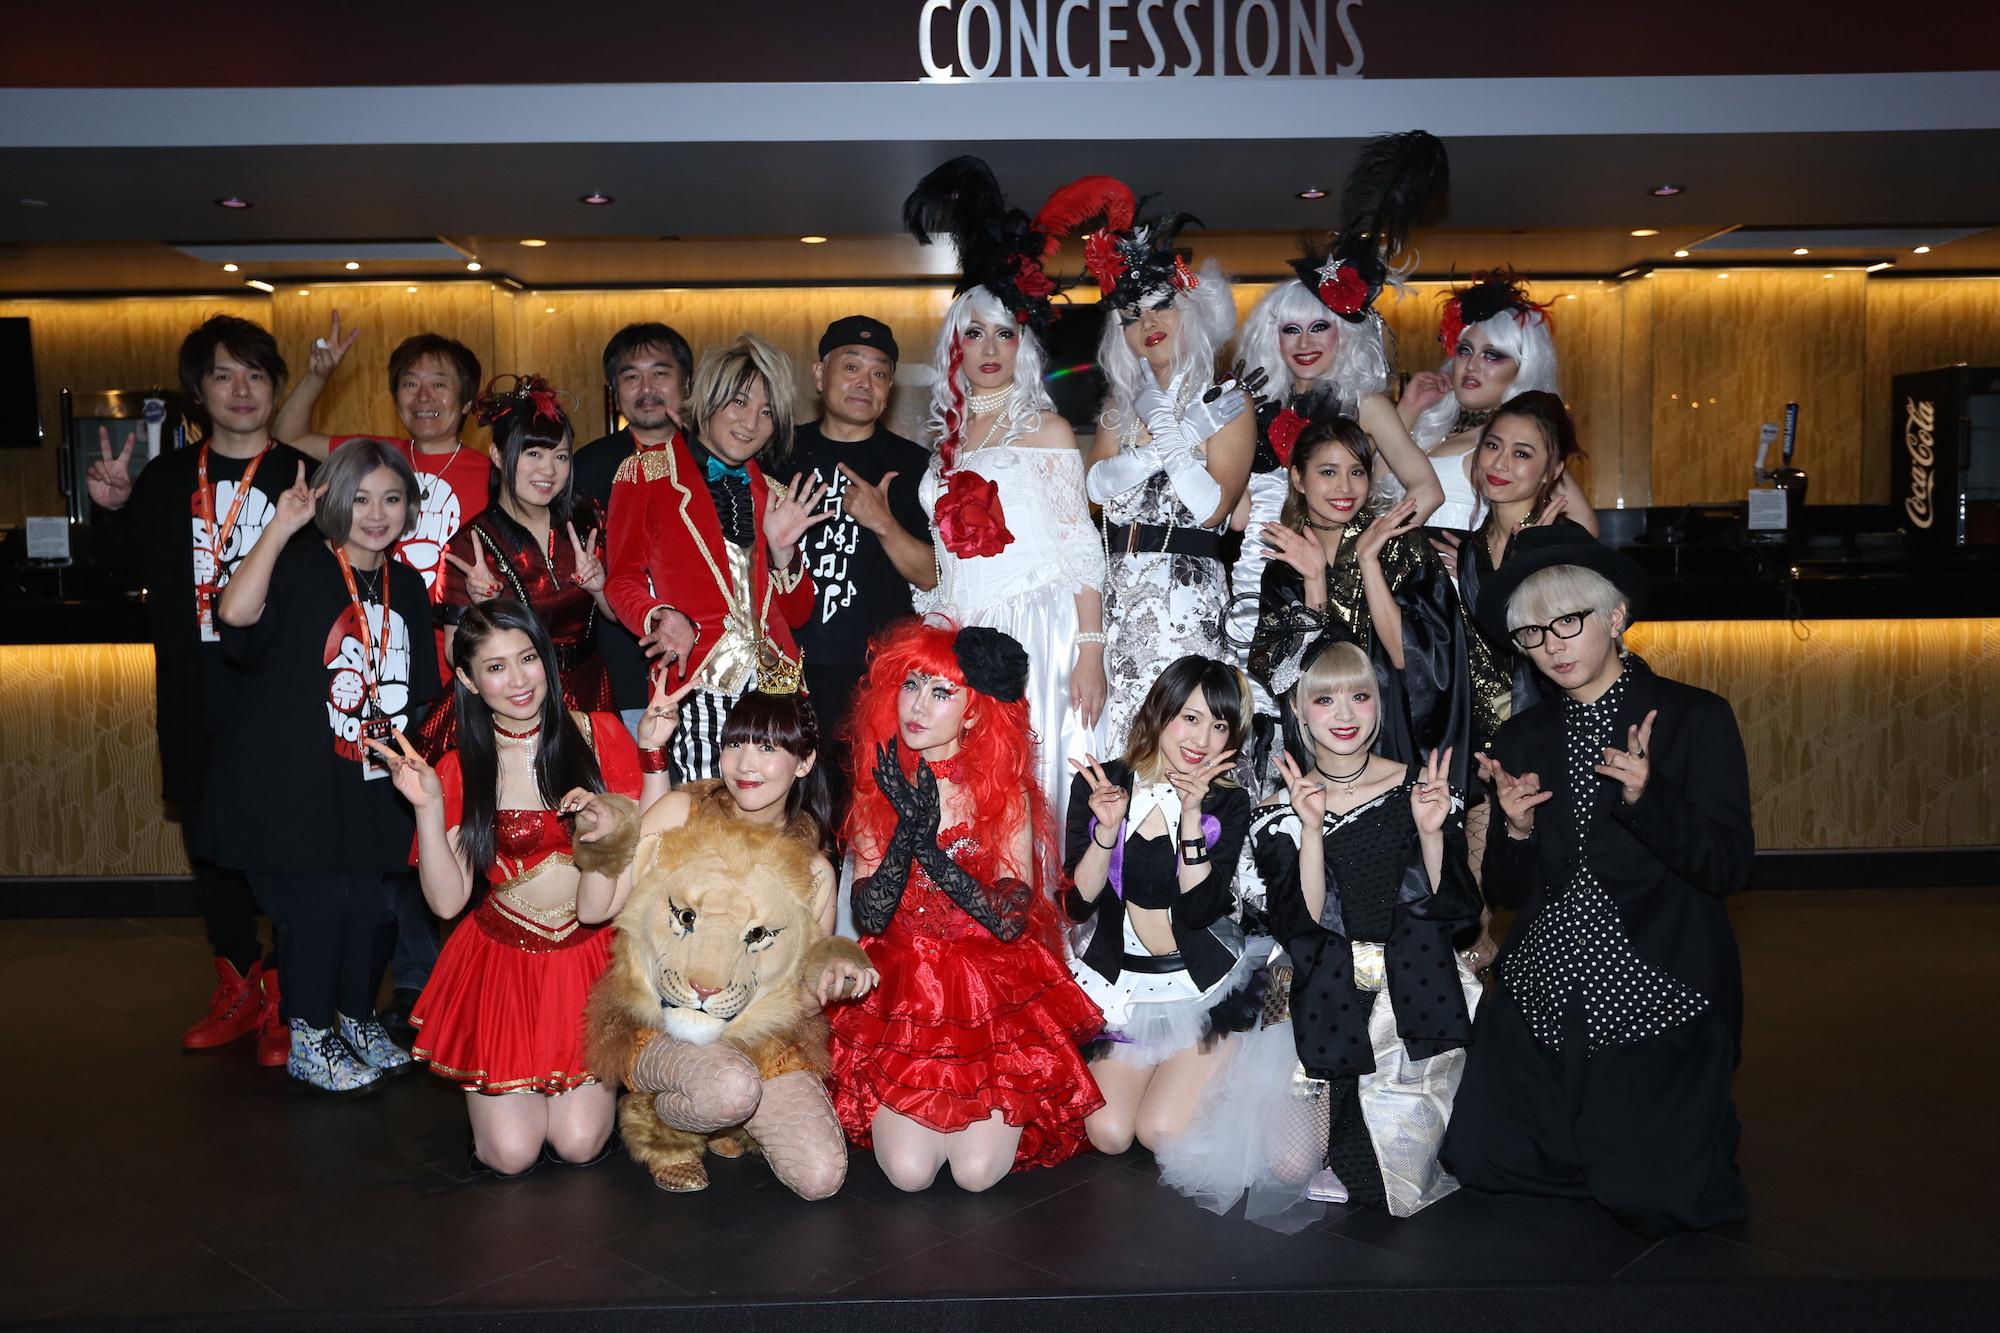 RMMS-AWMAX17-All-Japan-Super-Live-2017-07-01-4704